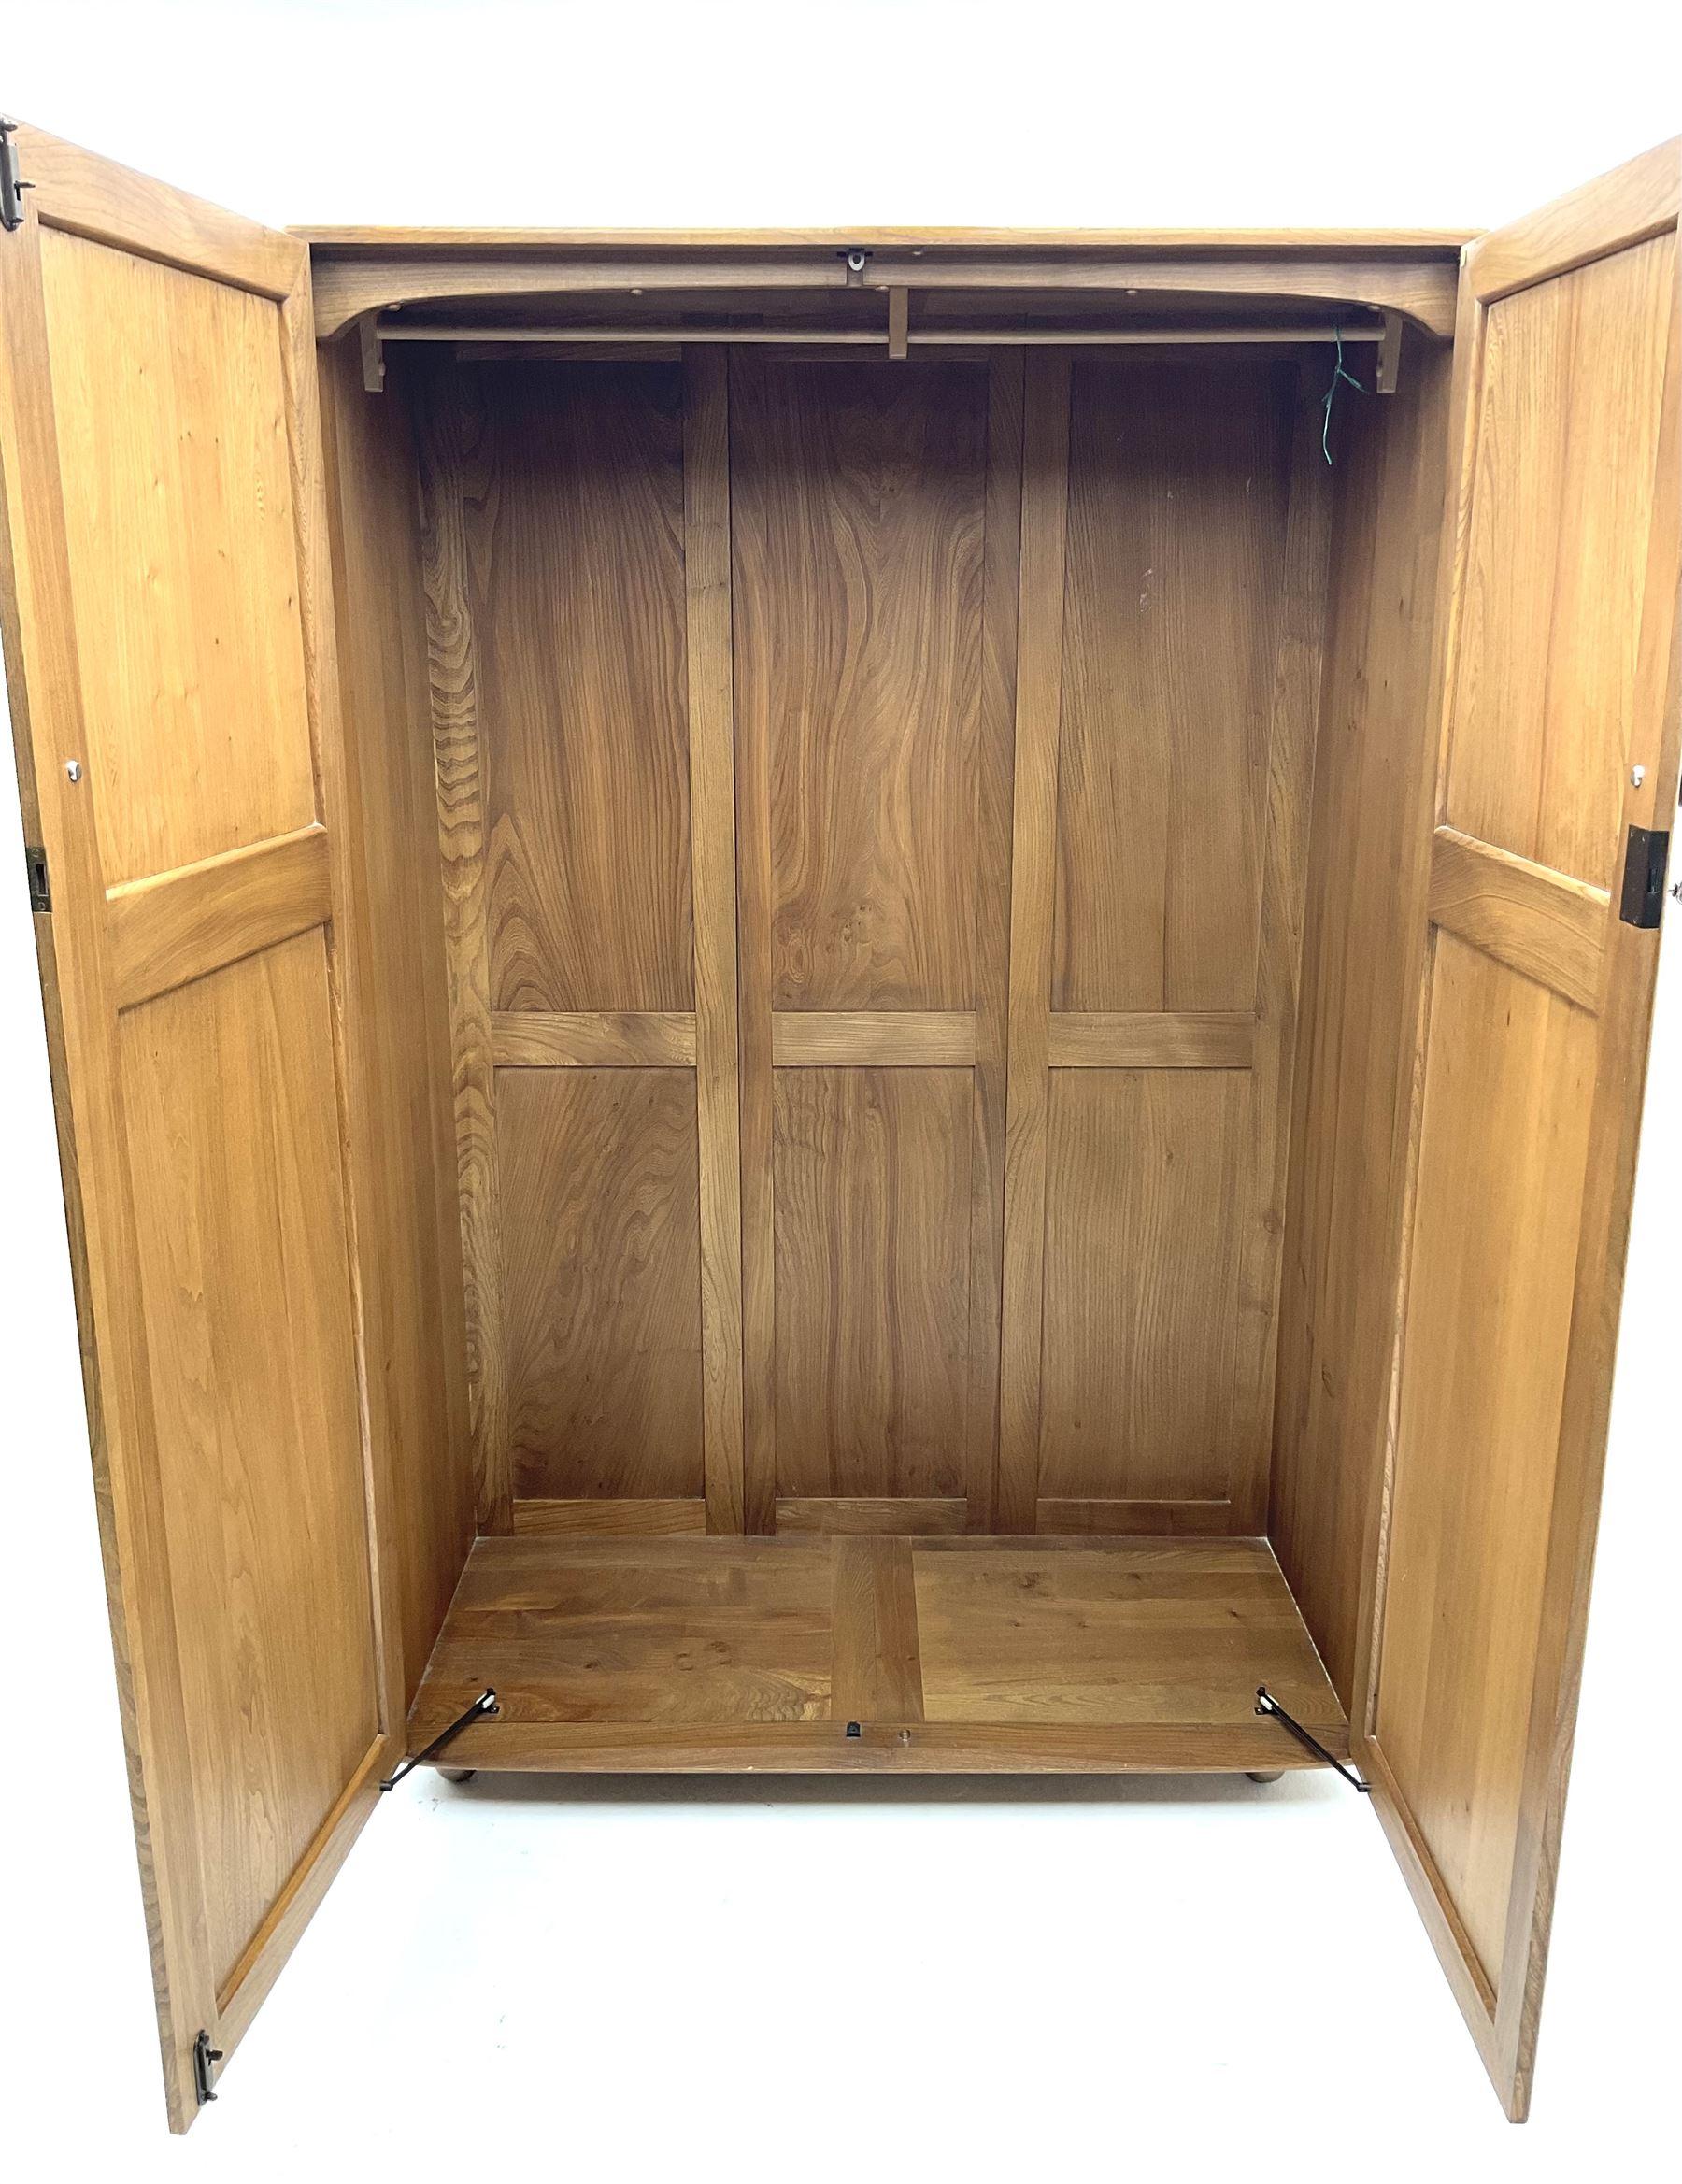 Ercol double wardrobe - Image 3 of 4